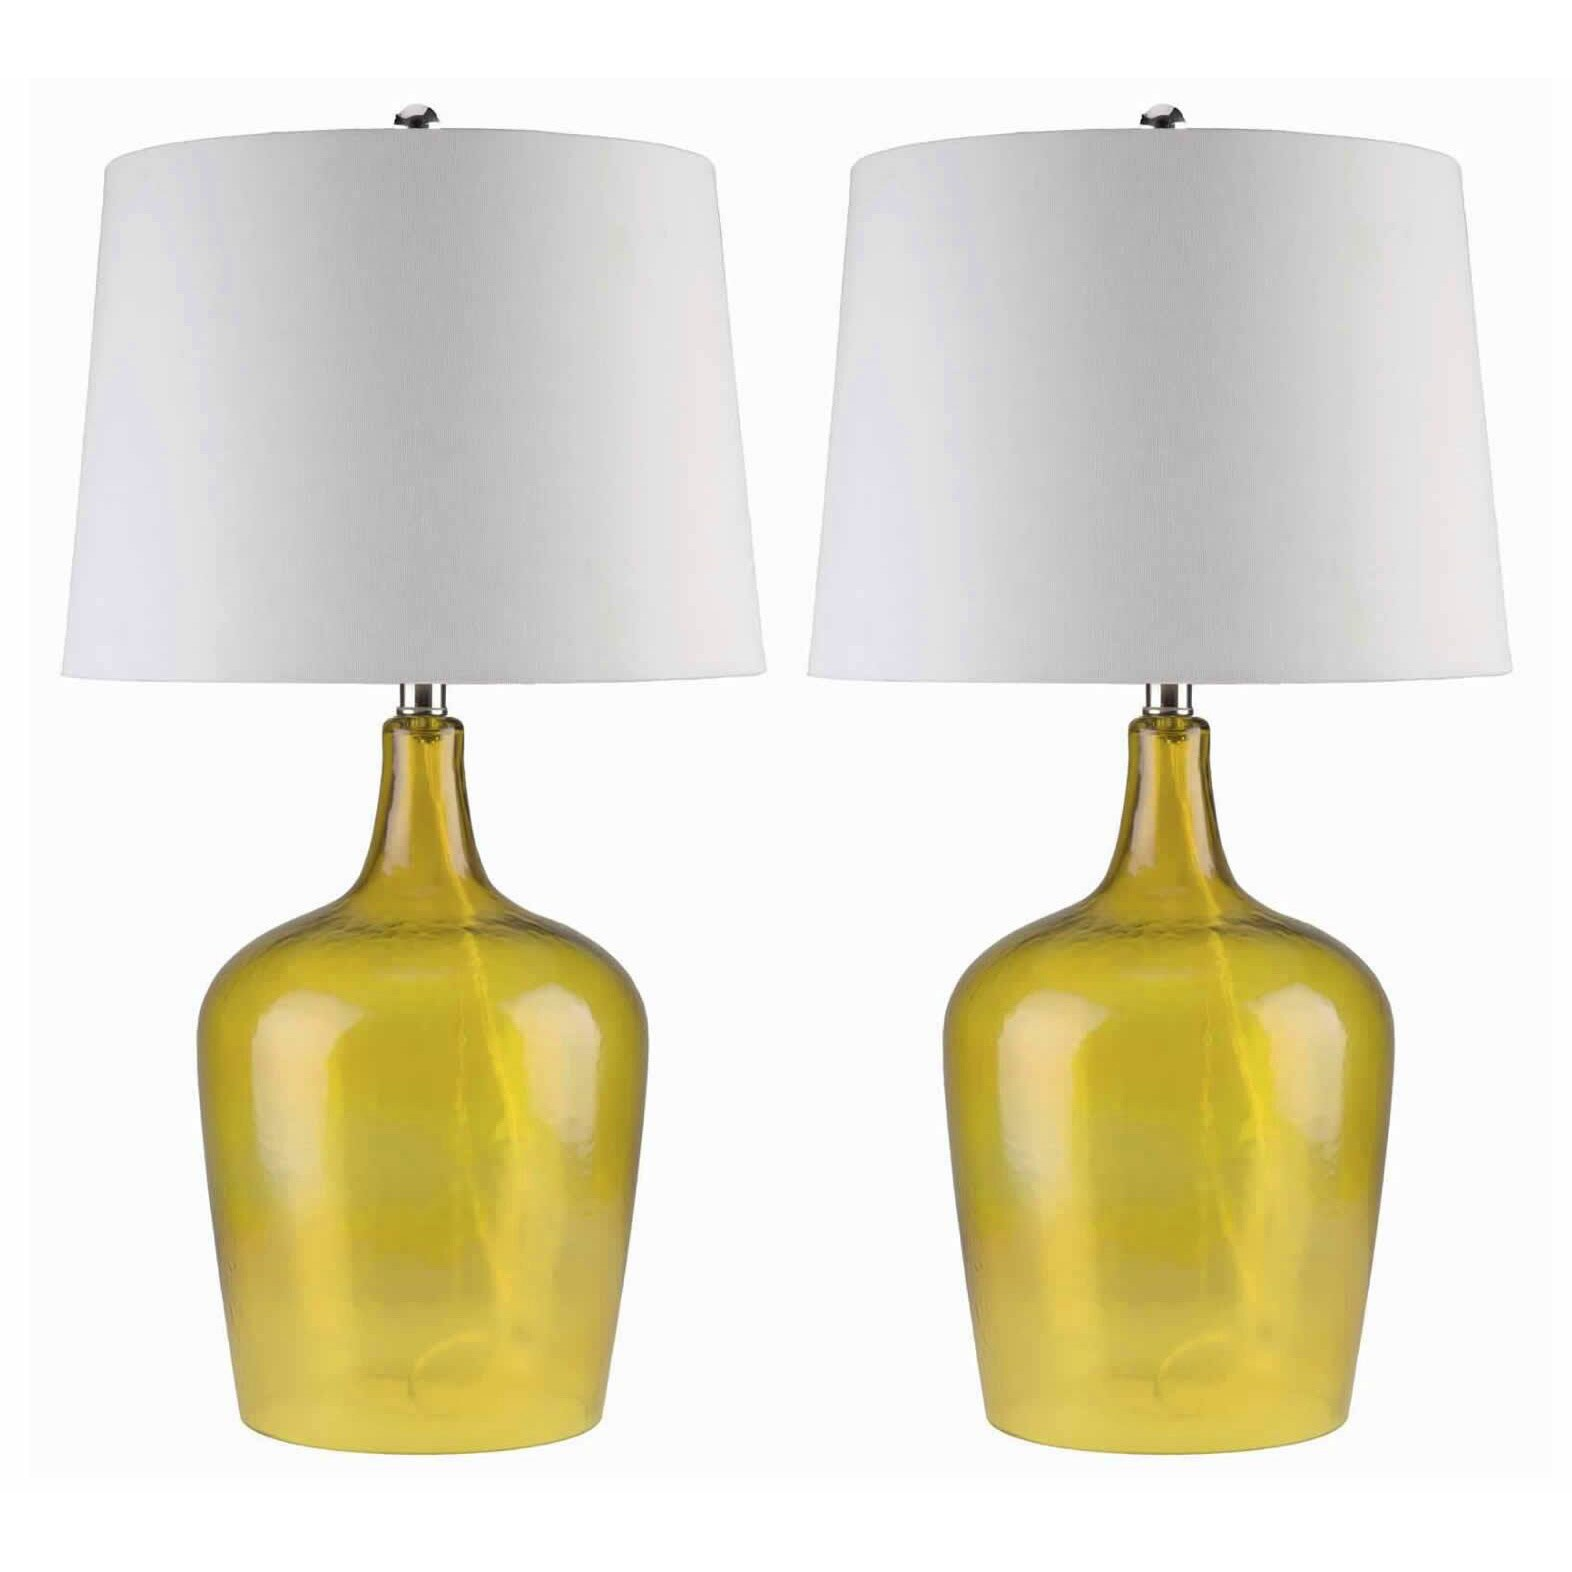 Shop Abbyson Azure Yellow Glass Table Lamp Set Of 2 Free